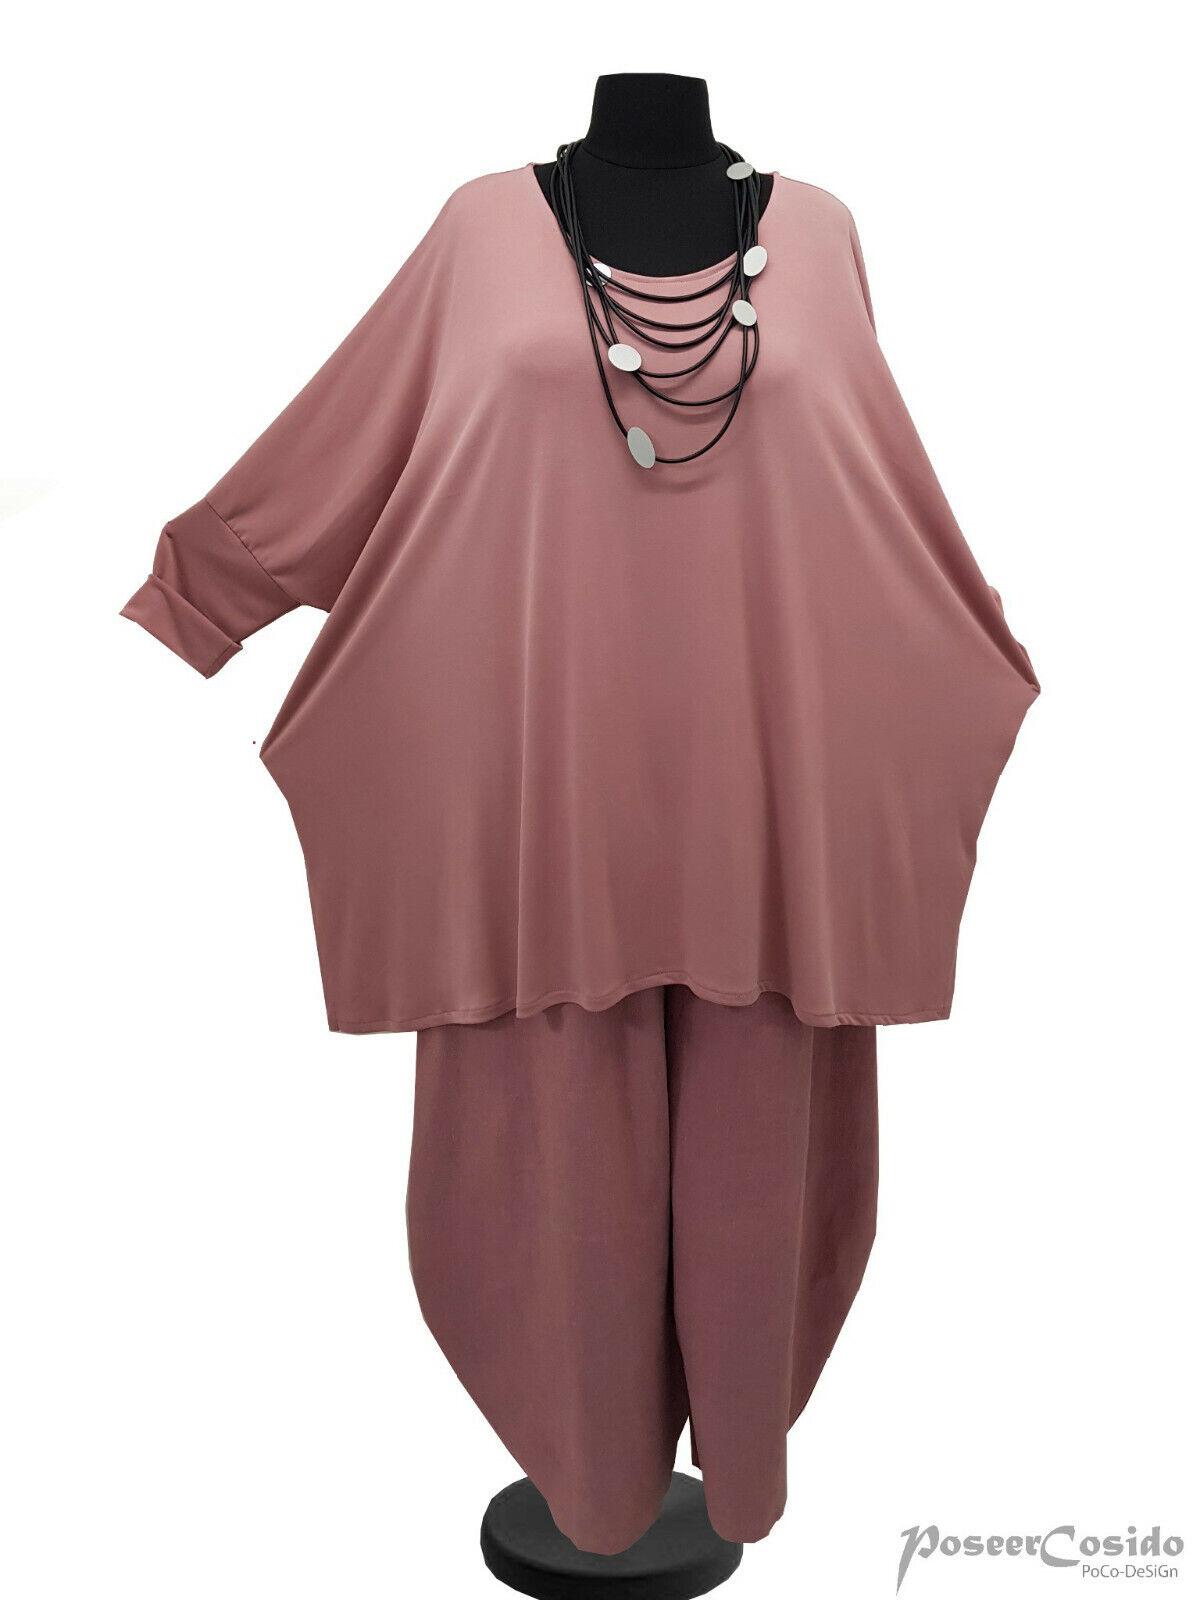 LAGENLOOK Tunika Long-Shirt OverGröße Rosa 44 46 48 50 52 54 56 58 L-XL-XXL-XXXL